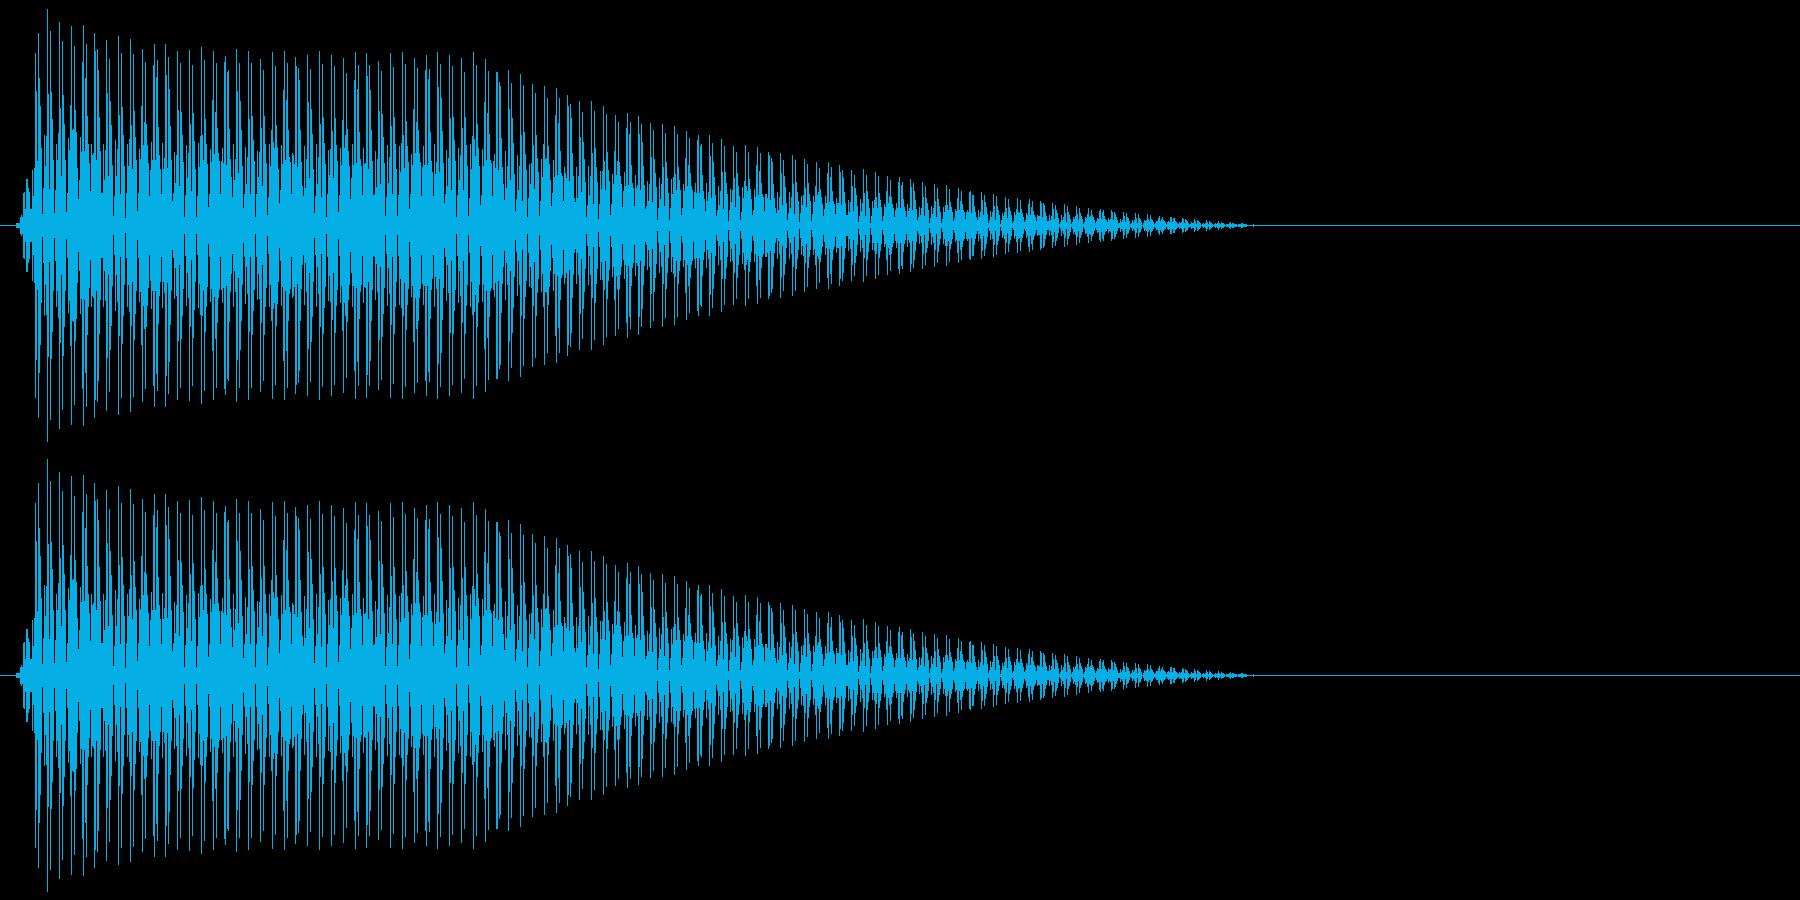 OctaveCom アプリ用タッチ音11の再生済みの波形